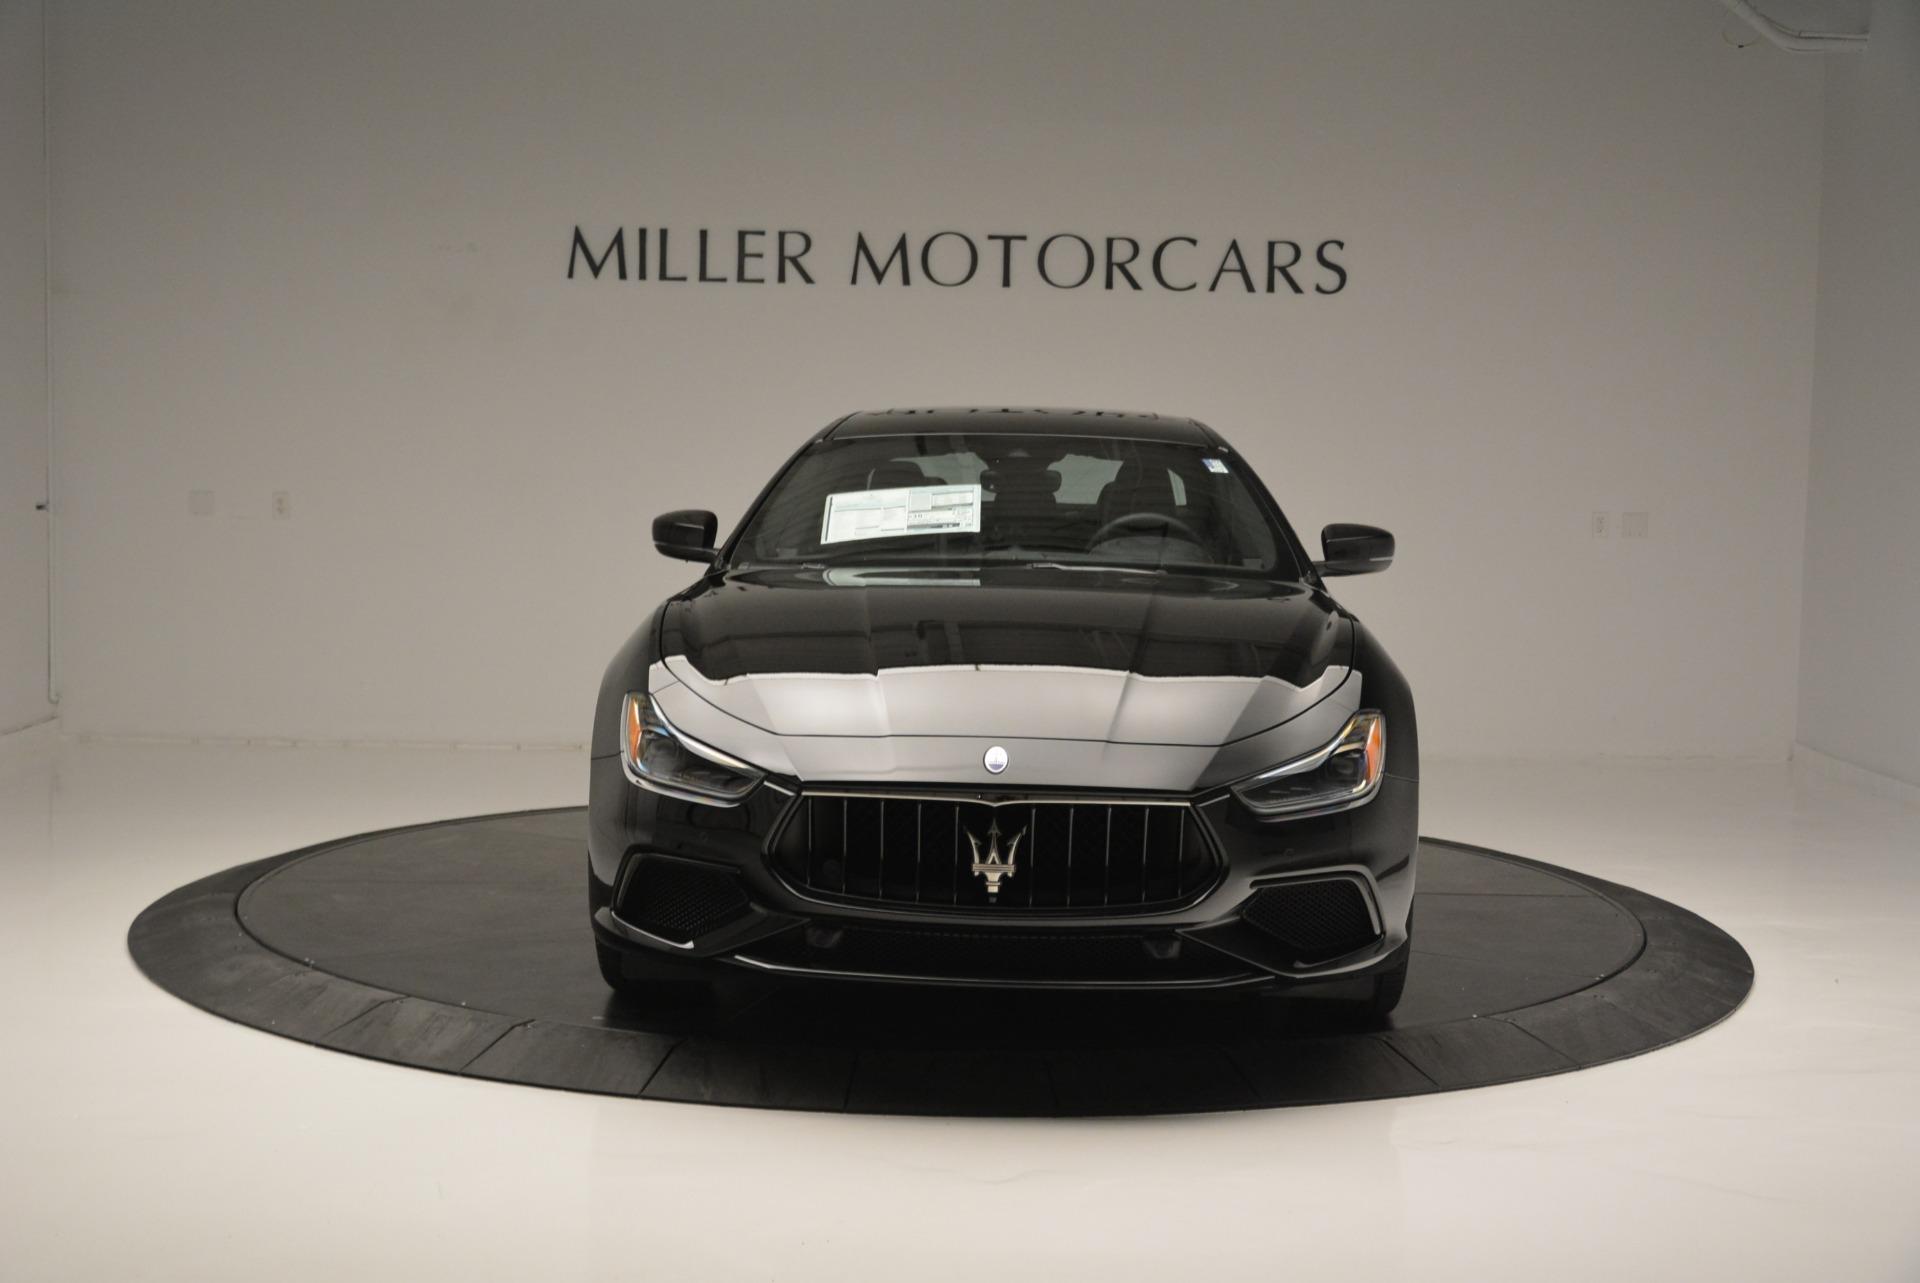 New 2018 Maserati Ghibli SQ4 GranSport Nerissimo For Sale In Westport, CT 2372_p12